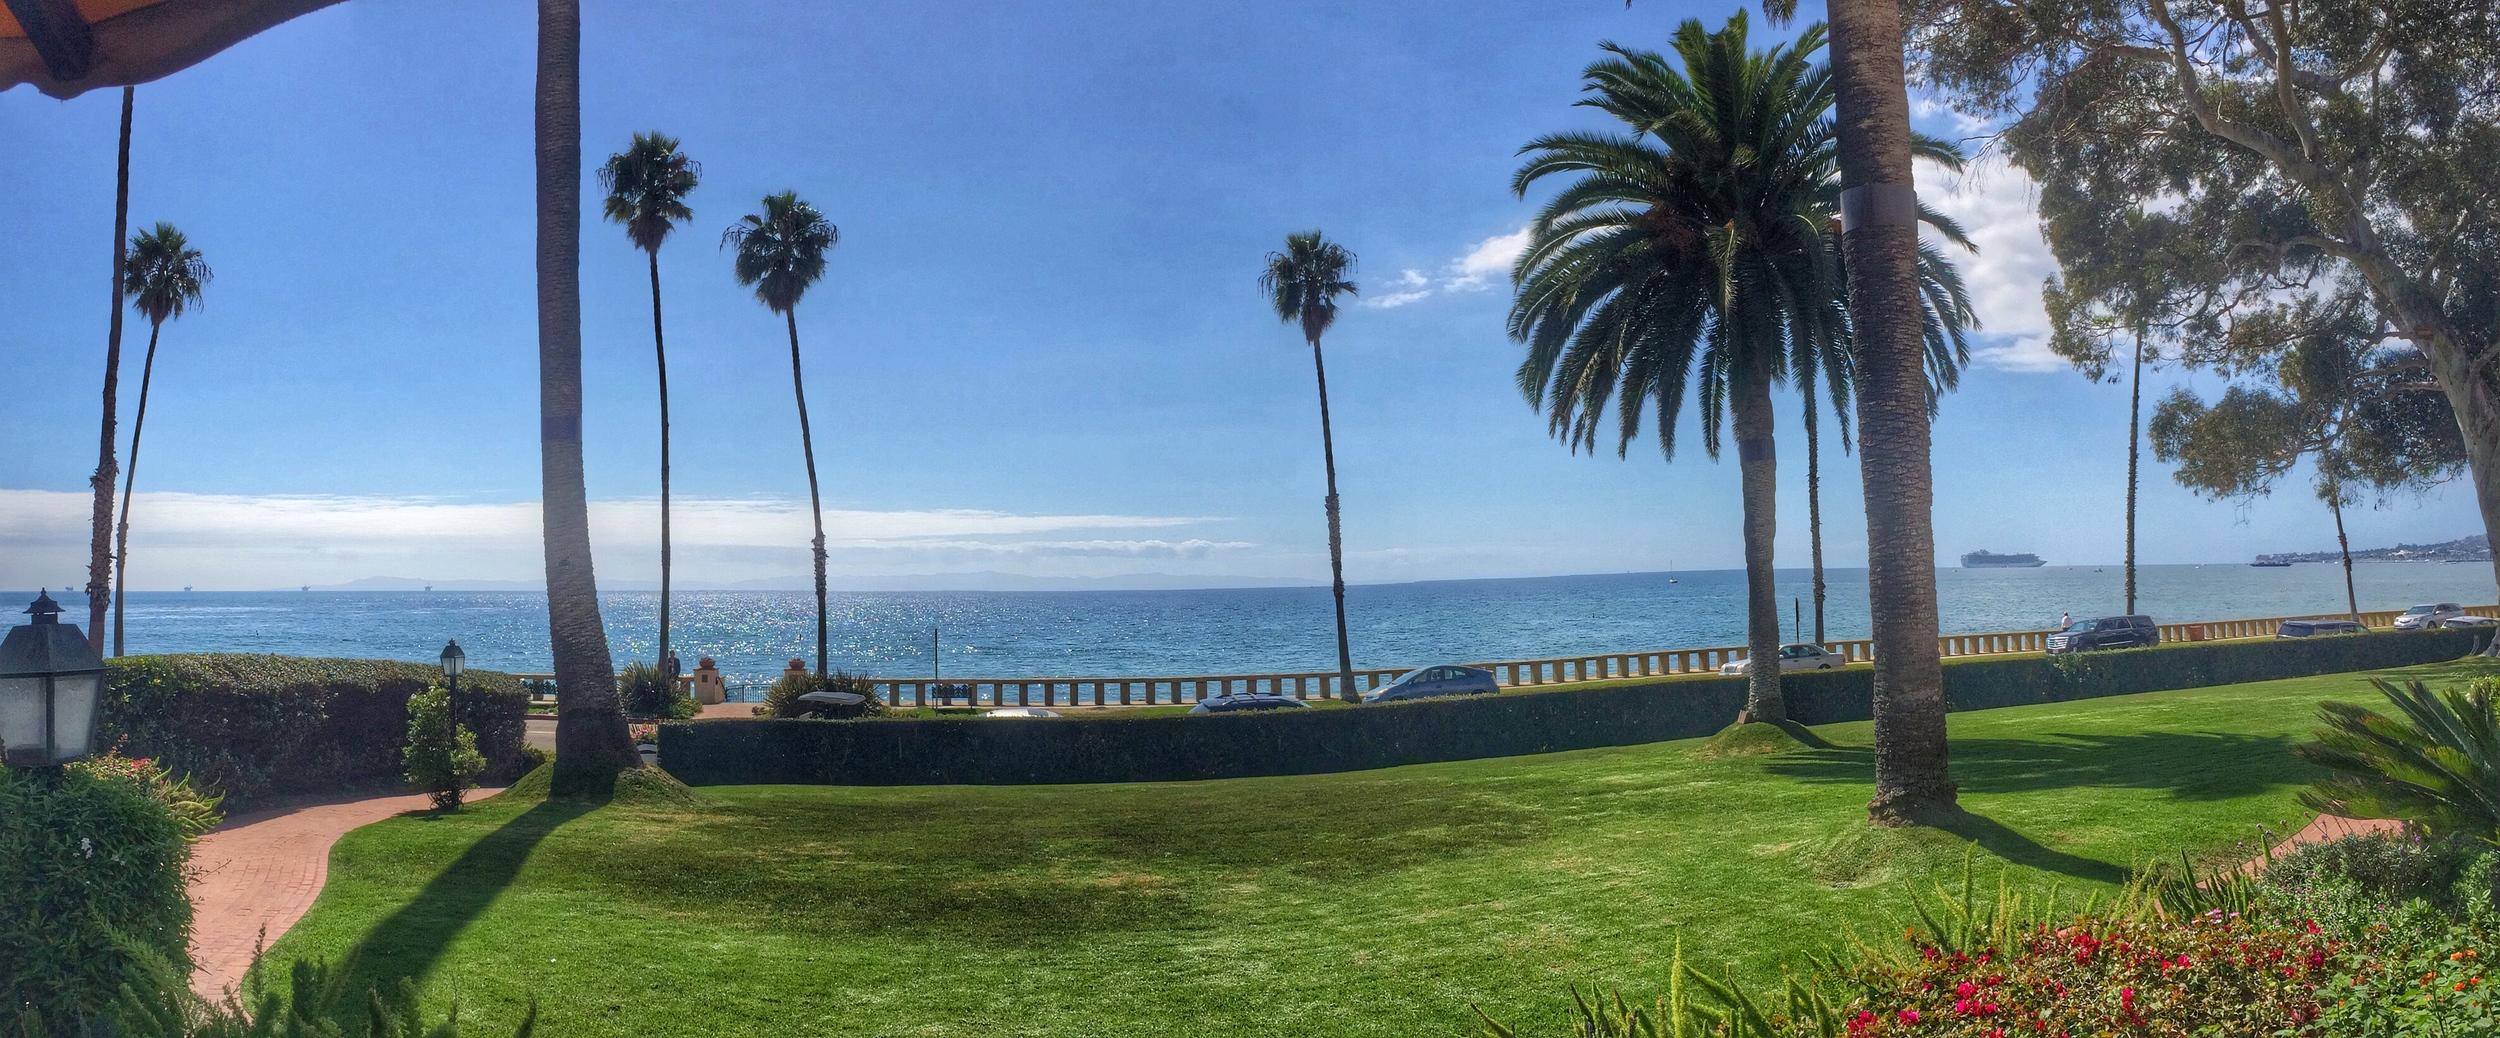 Pacific Ocean View for Breakfast